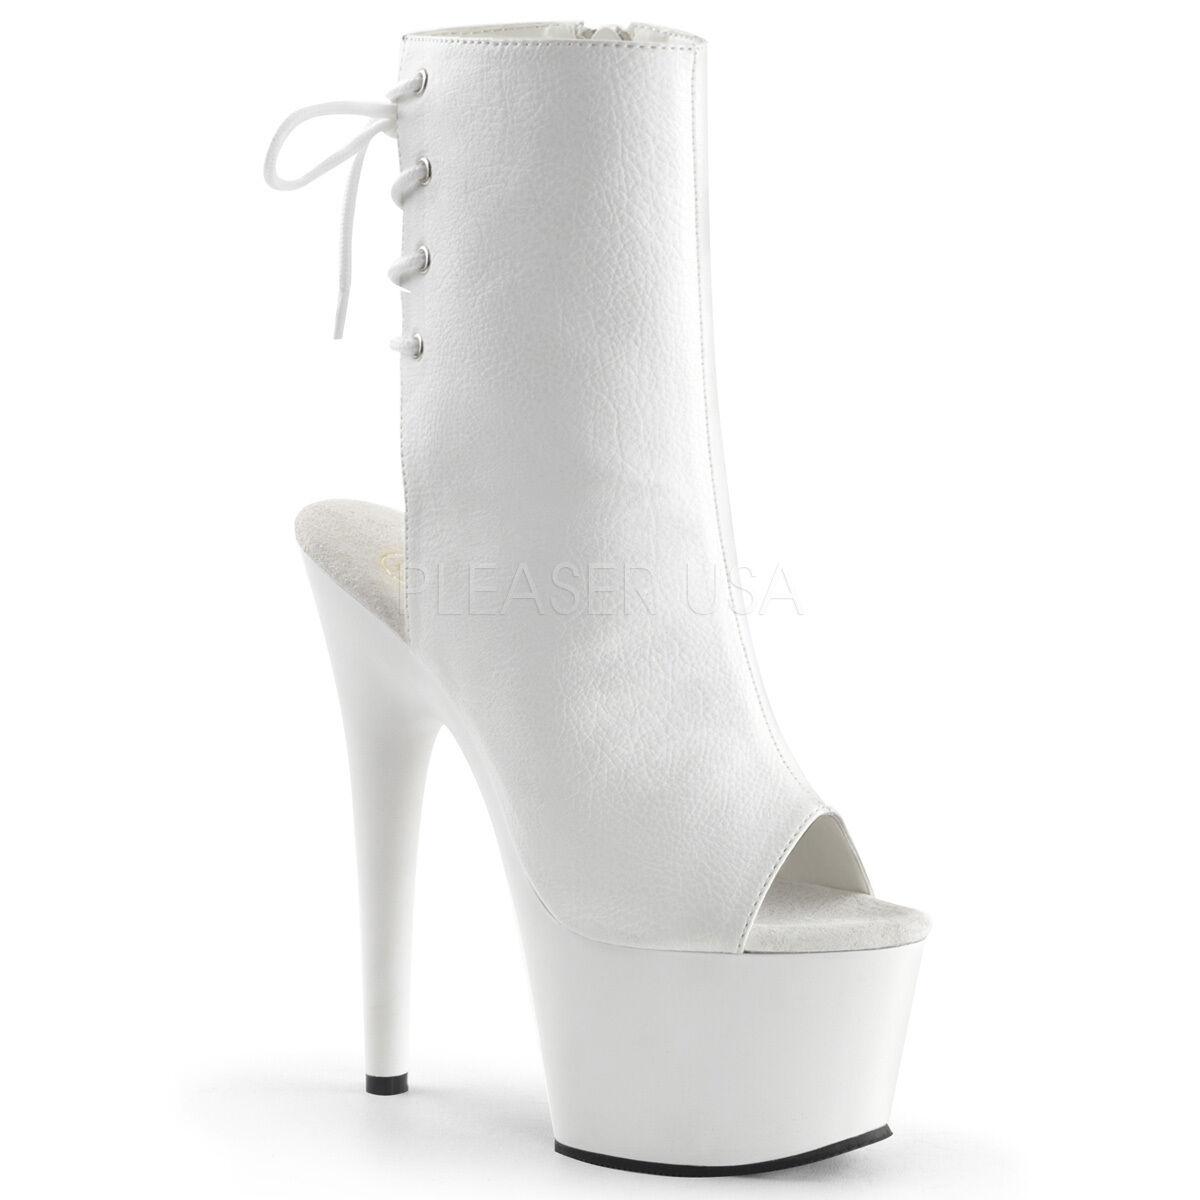 Pleaser Adore-1018 Sexy Platform White Pu 7  High Heels Stripper Ankle Boots